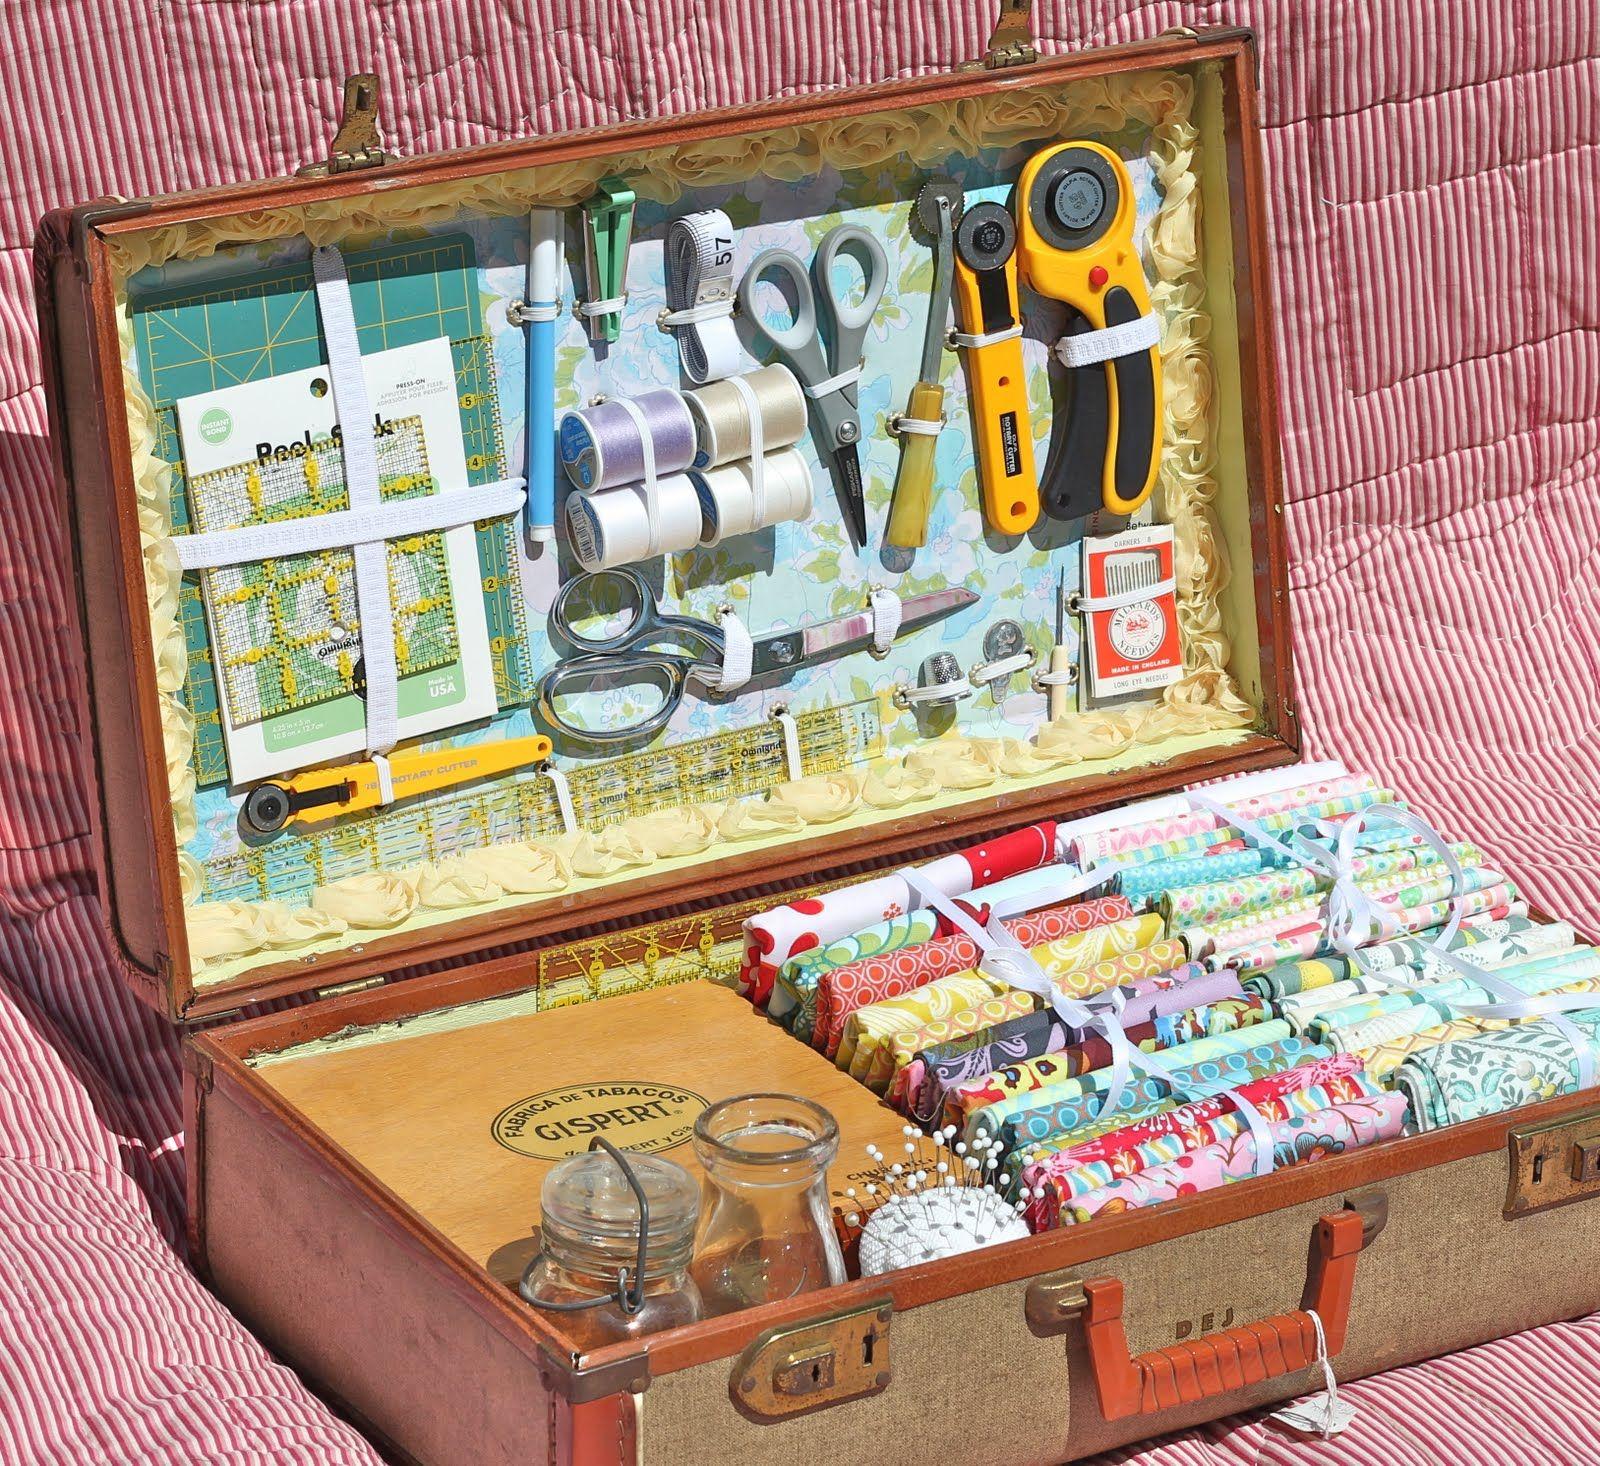 Una maleta adecuada para costuras de quilt...me encantó la idea, el orden..